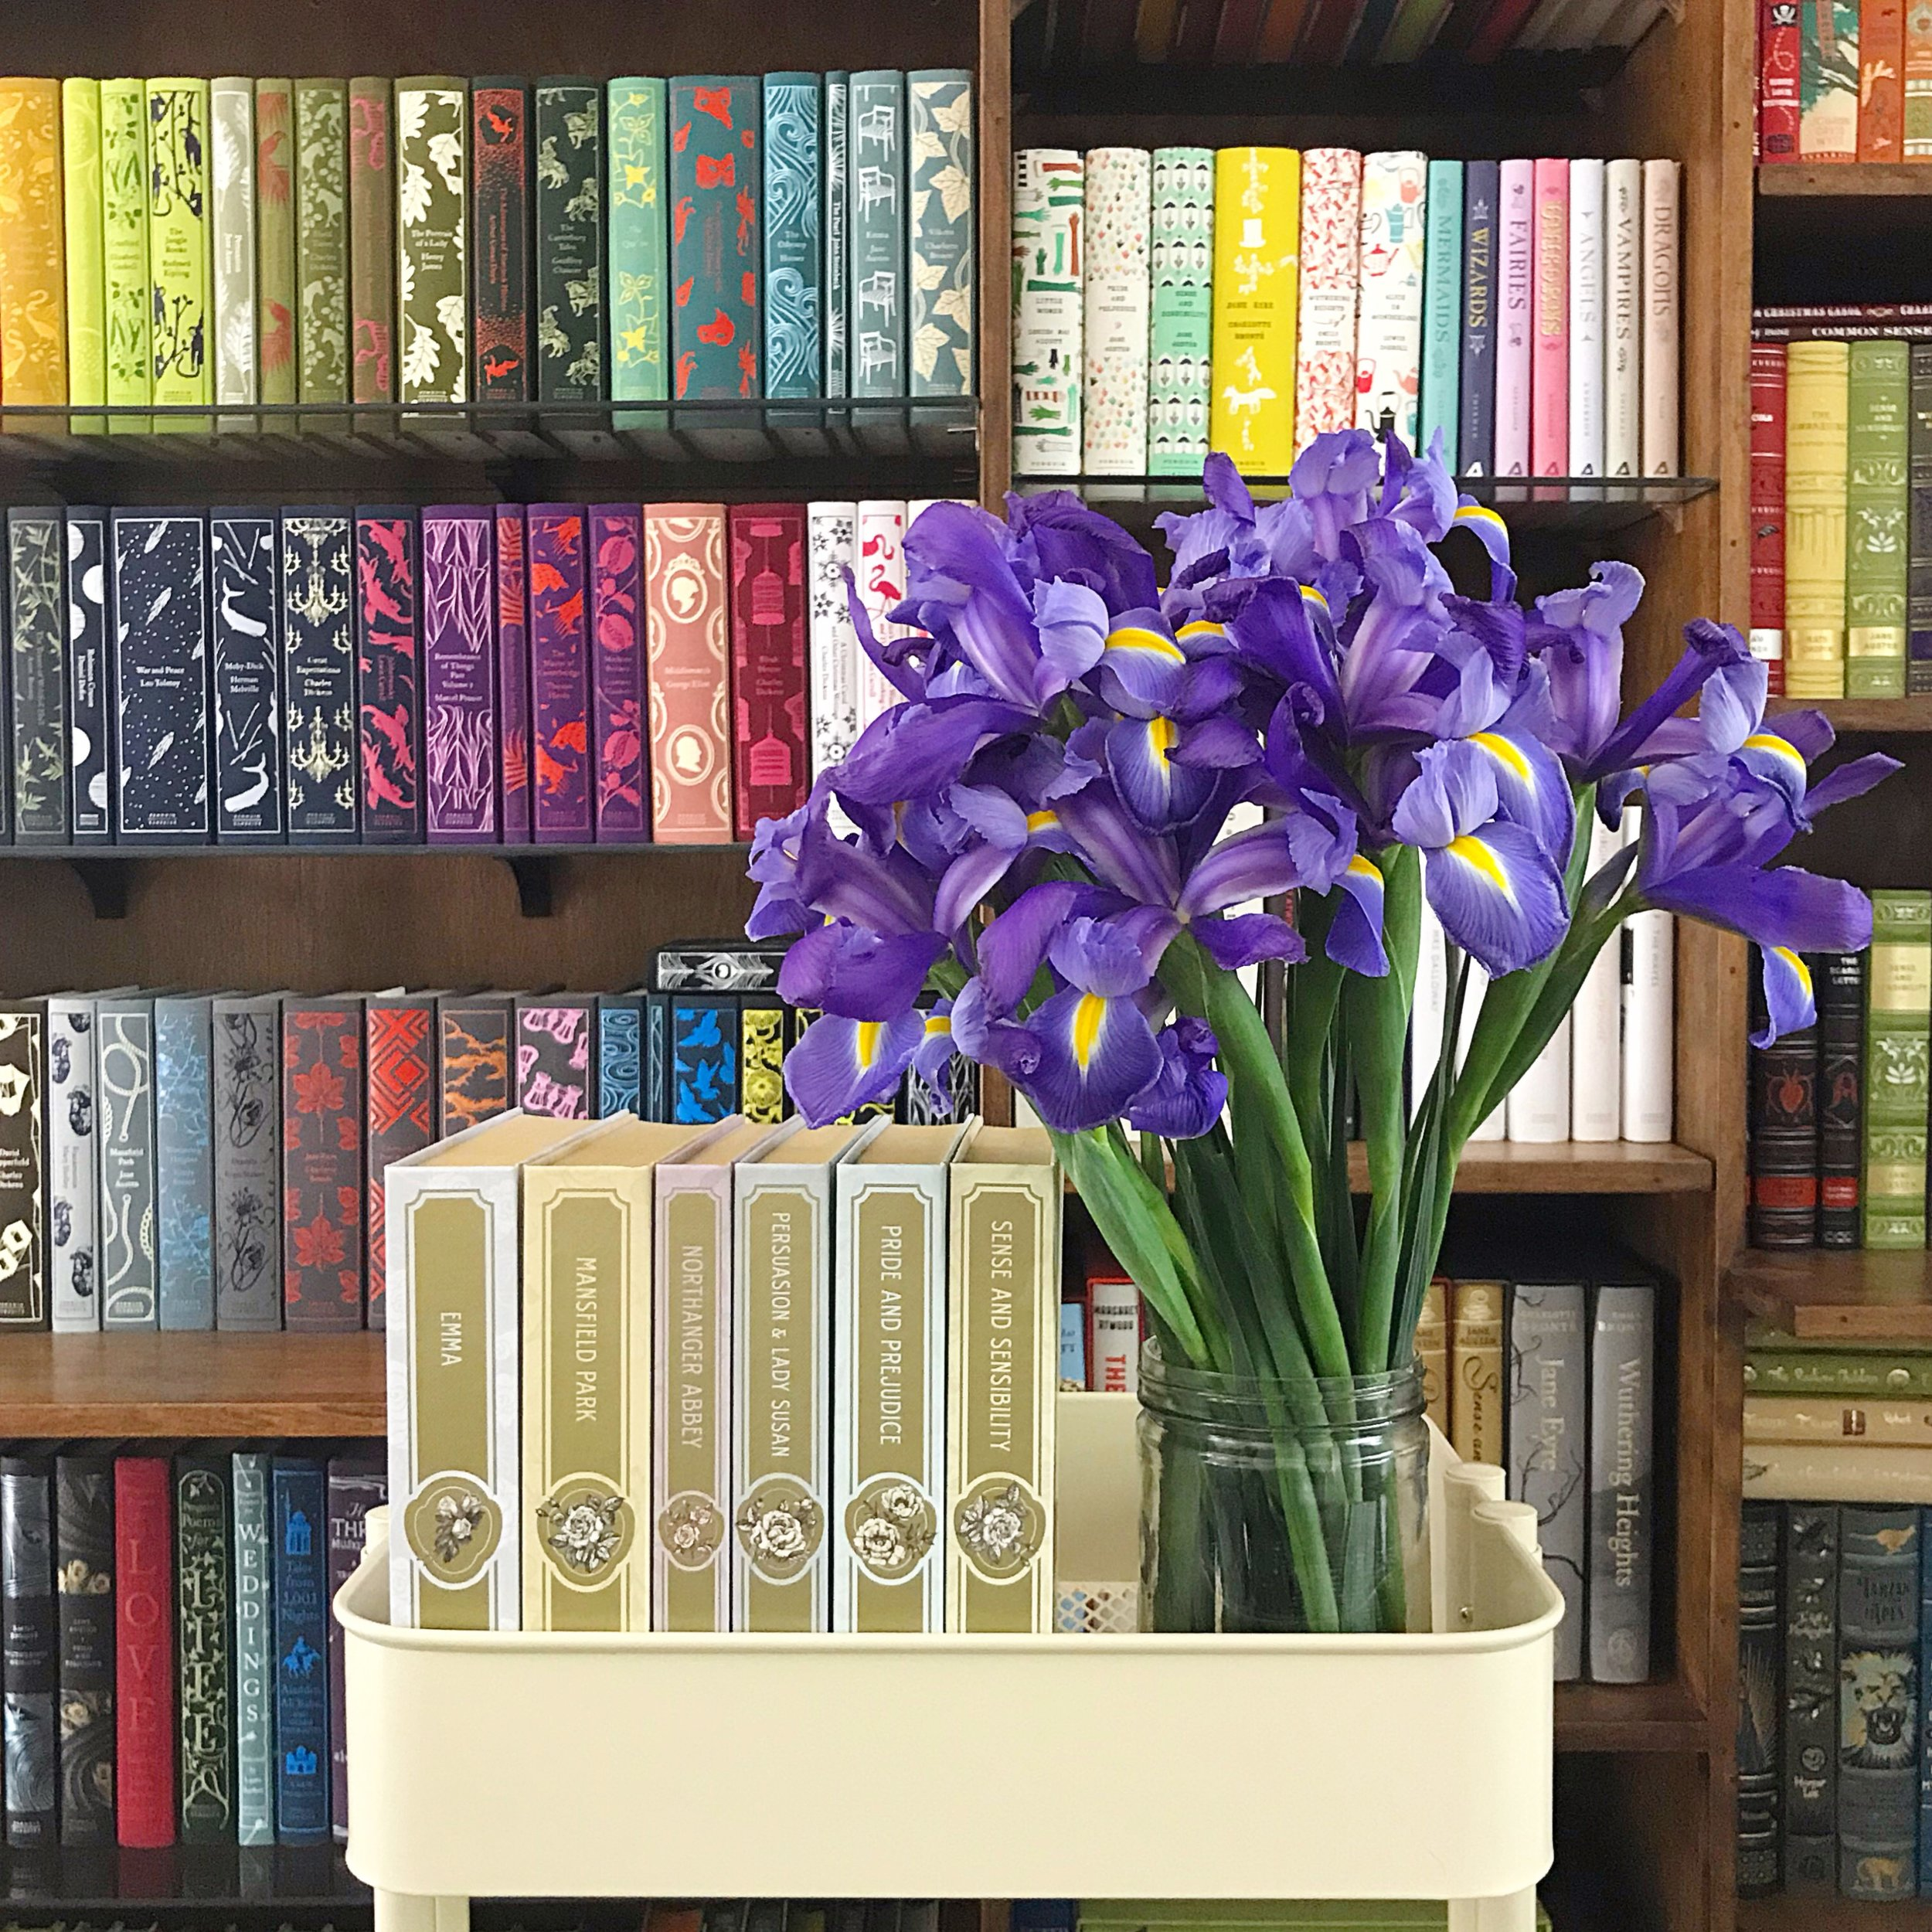 The Heirloom Collection Jane Austen -